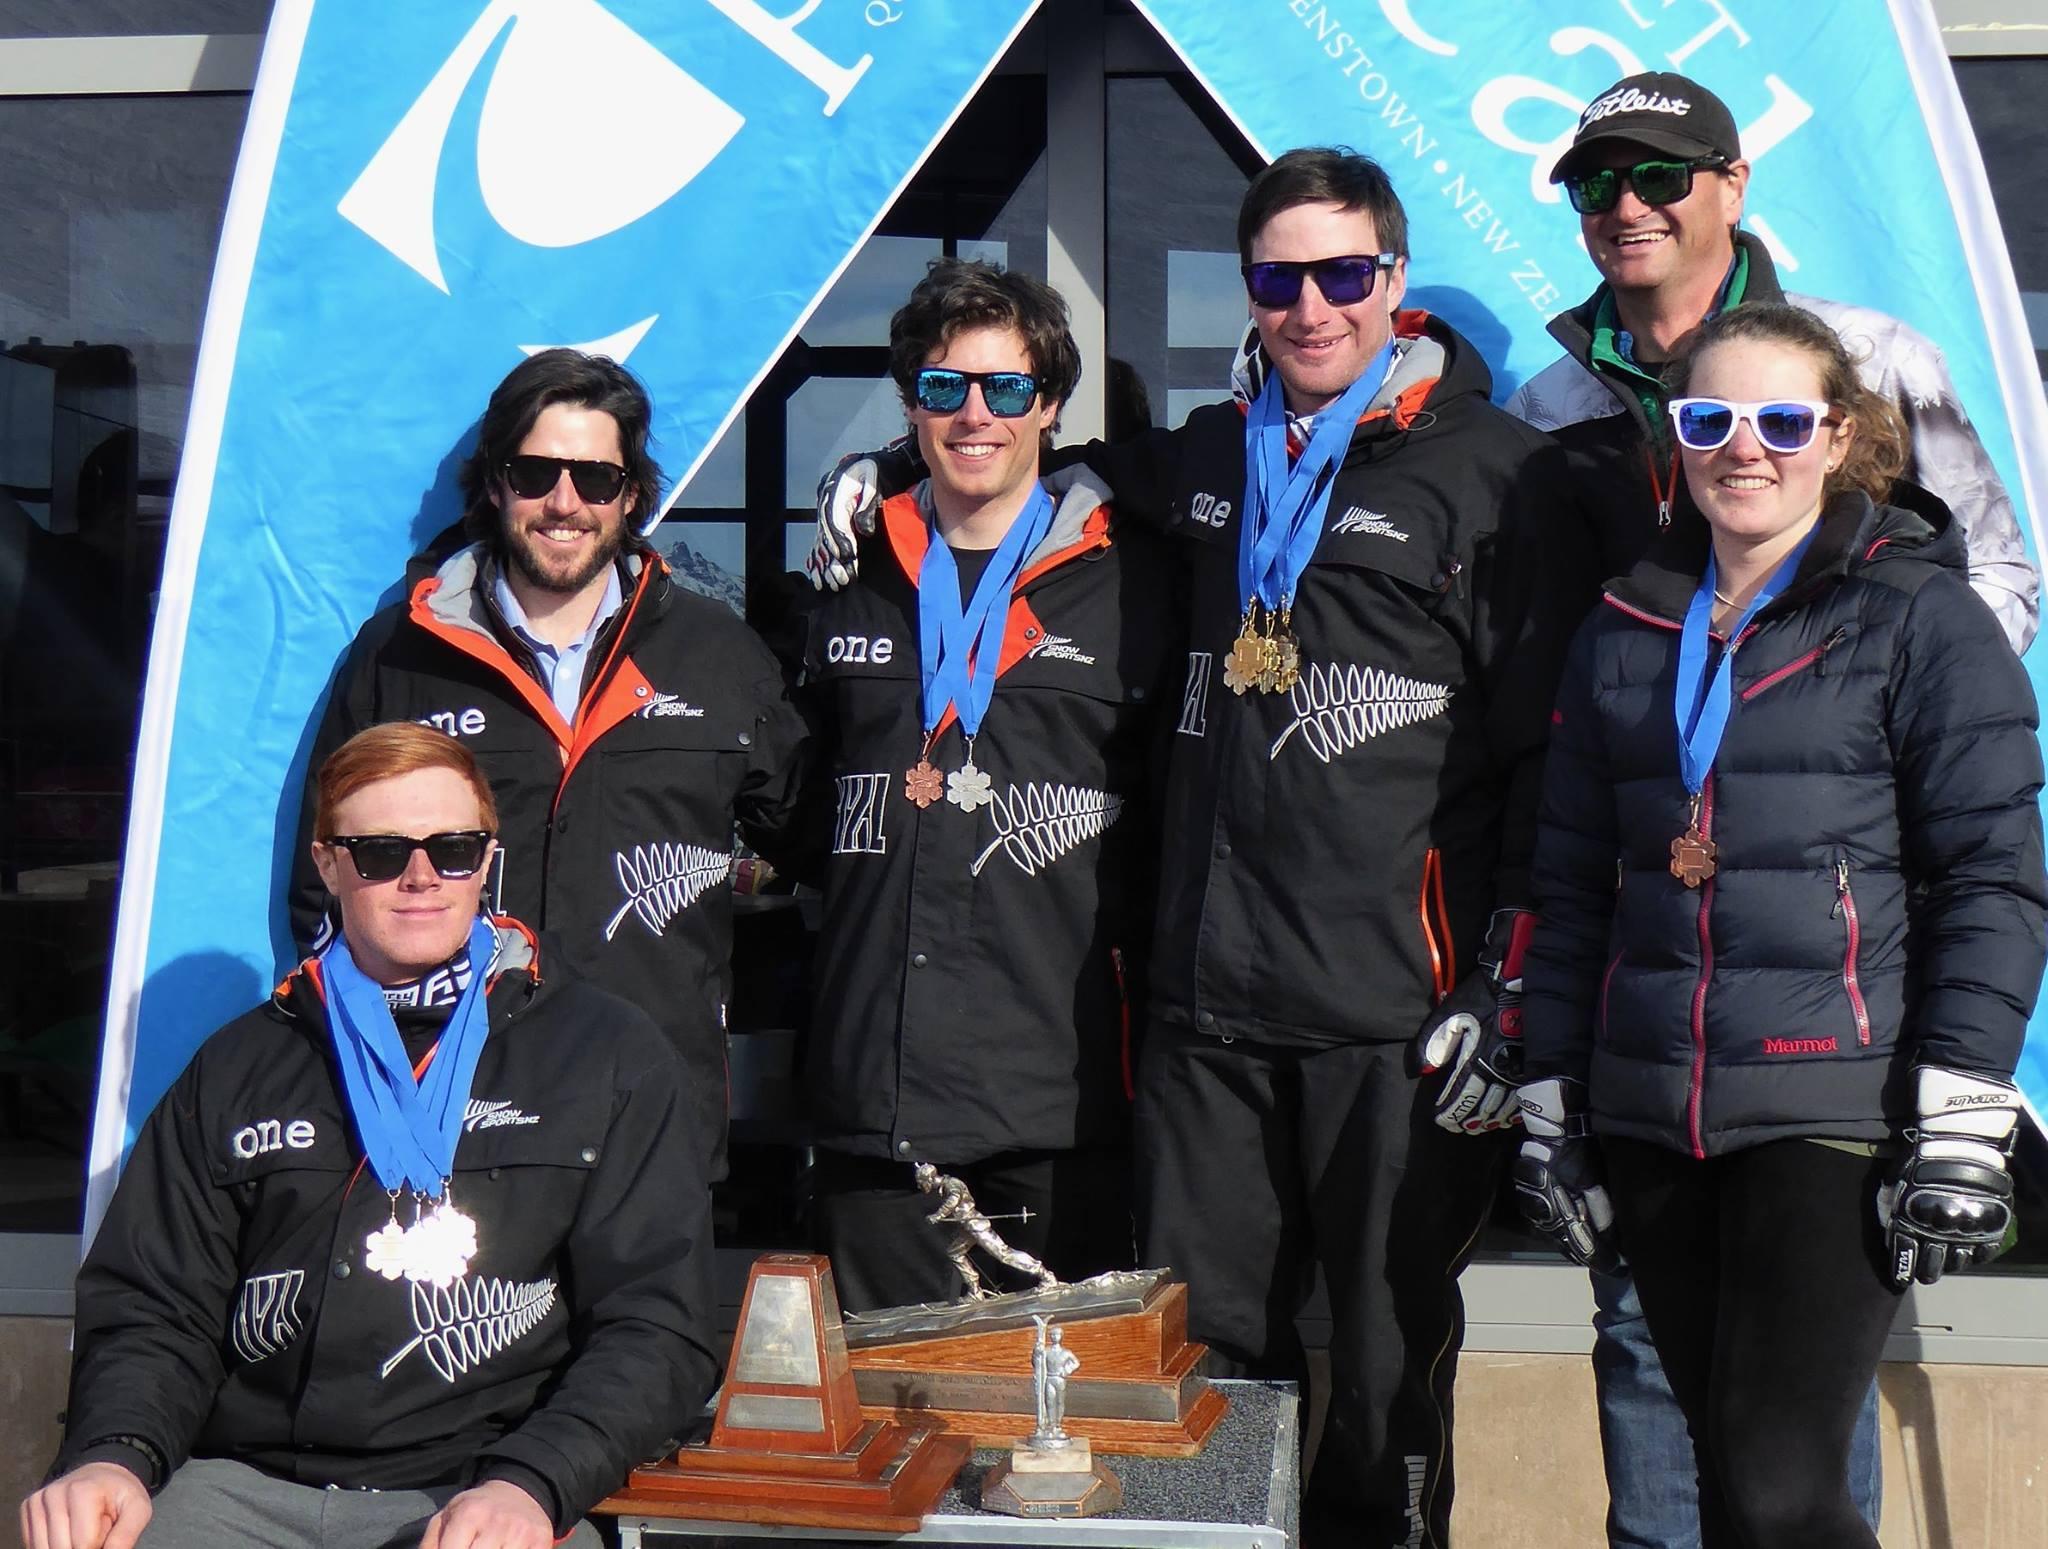 2015 Team (L-R Nick Prebble, Robbie Moore, Adam Barwood, Willis Feasey, Hamish Edward and I)